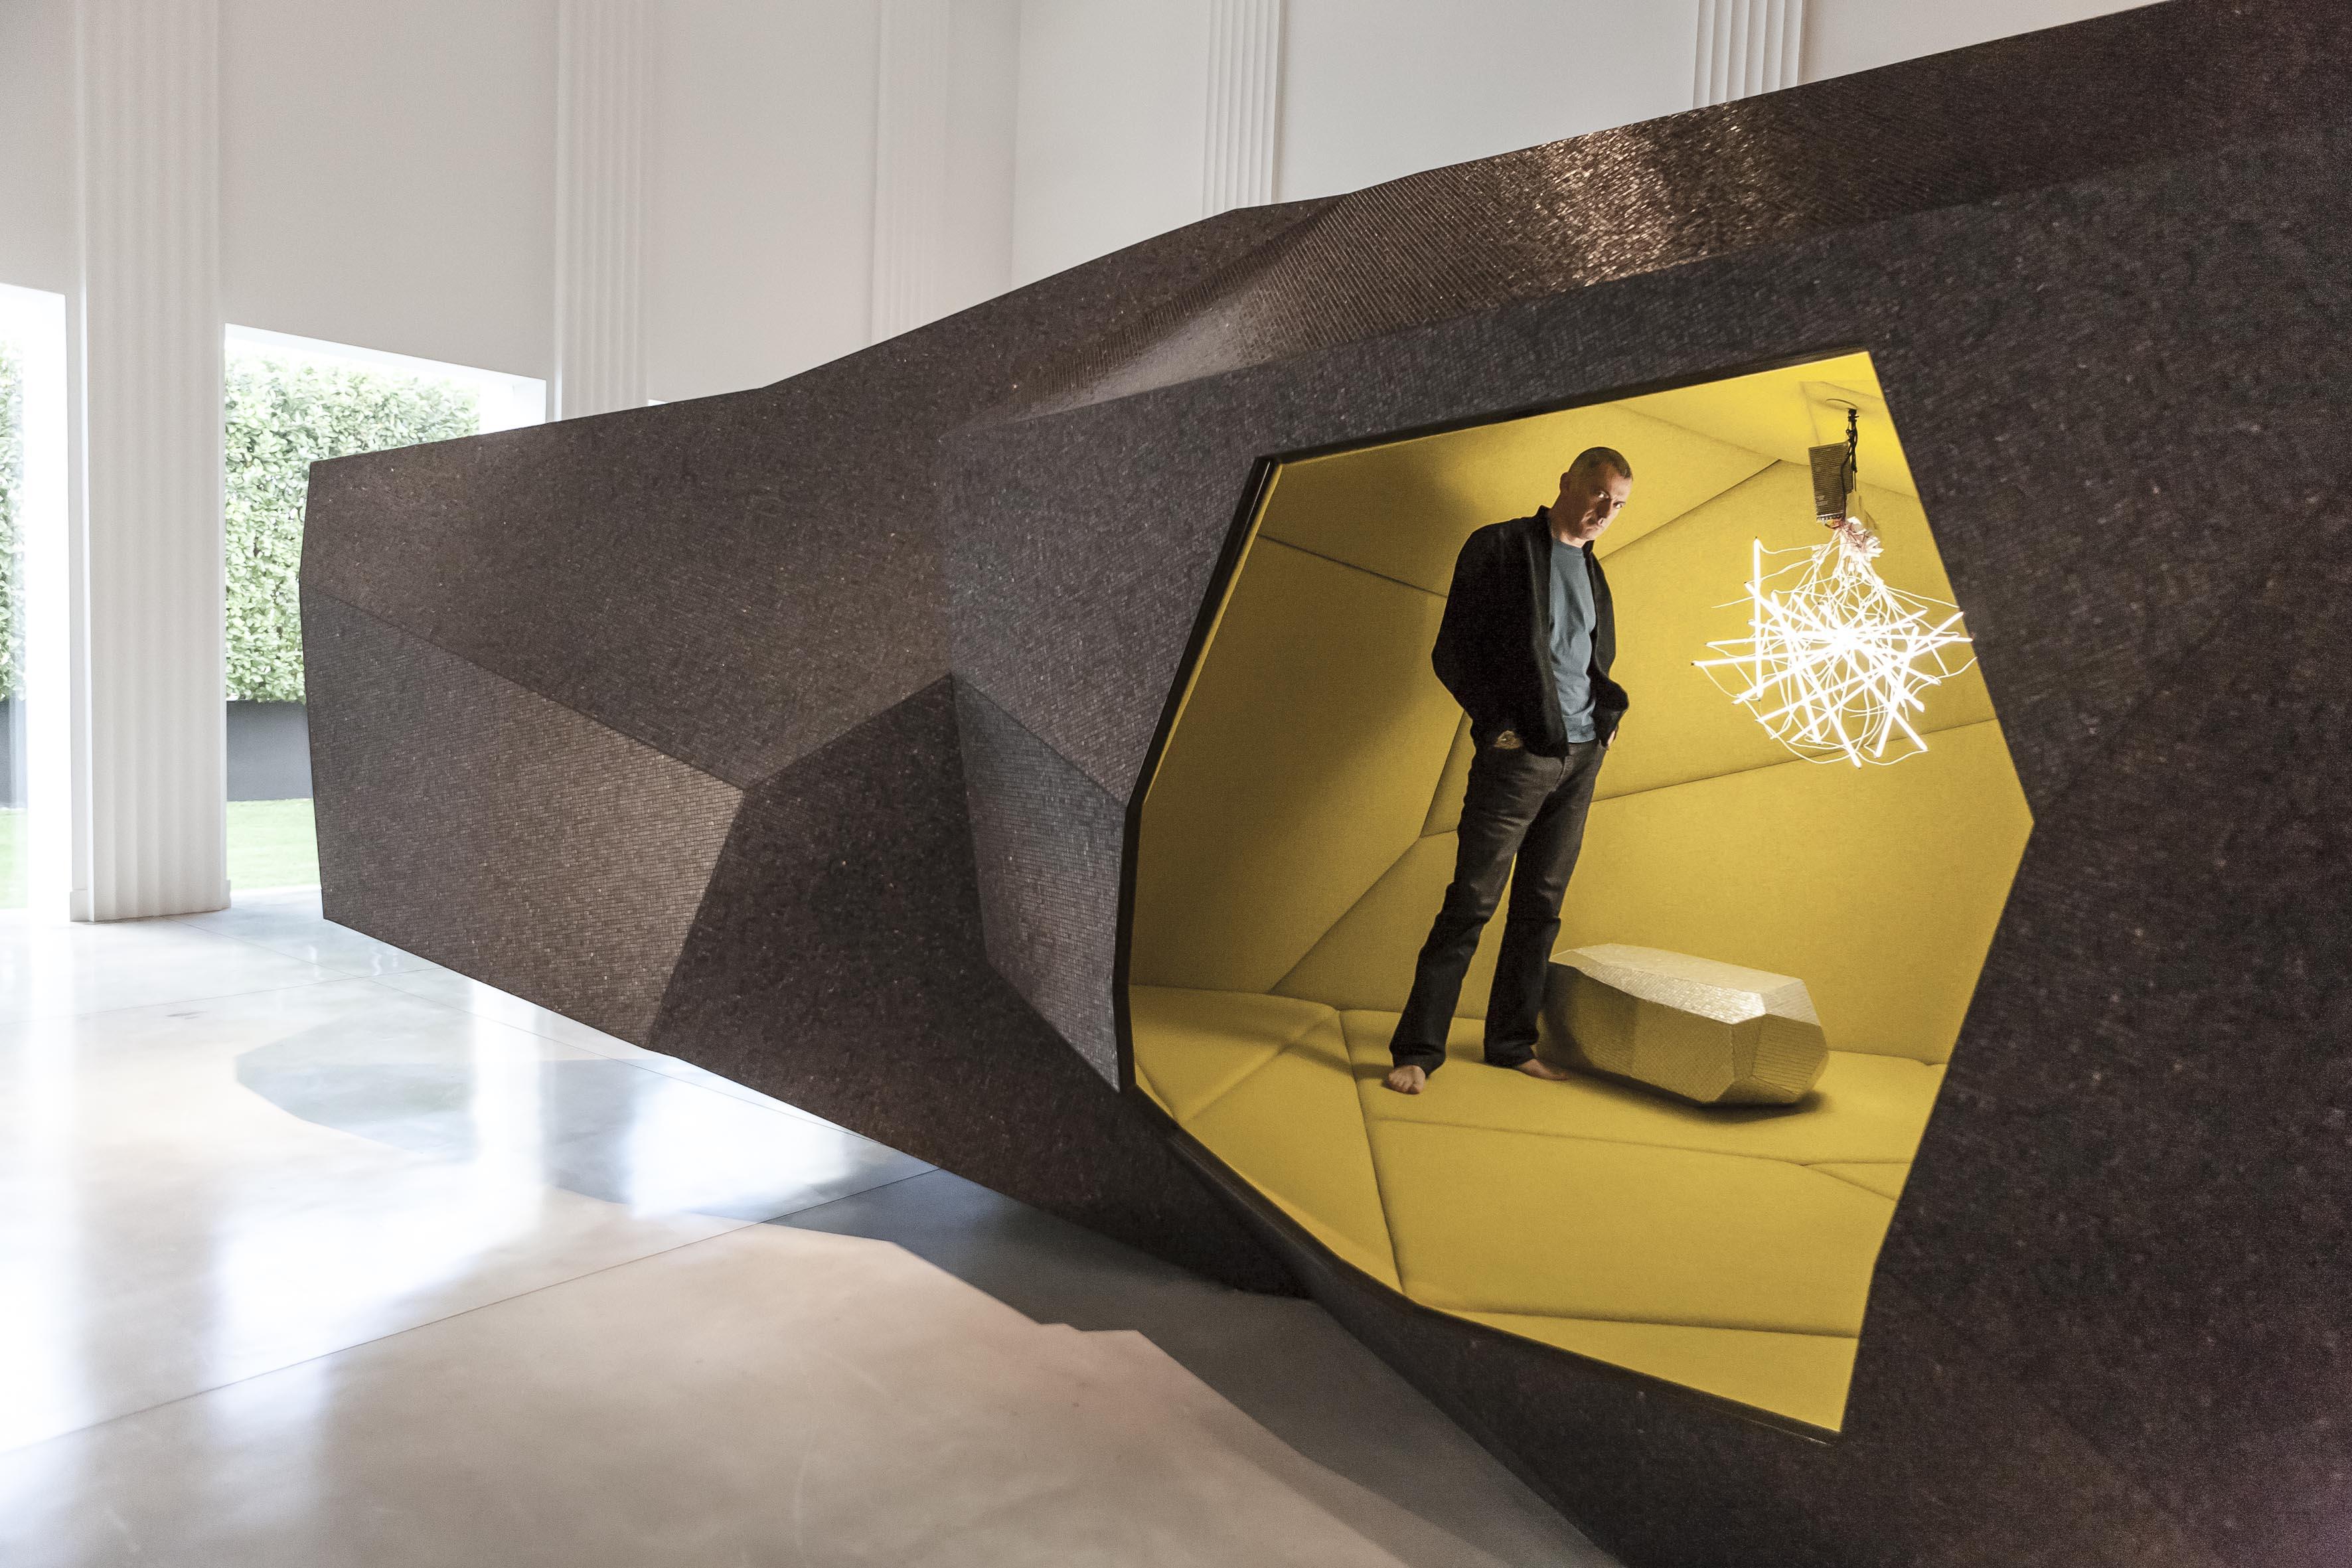 bisazza foundation x arik levy design miami breakfast. Black Bedroom Furniture Sets. Home Design Ideas